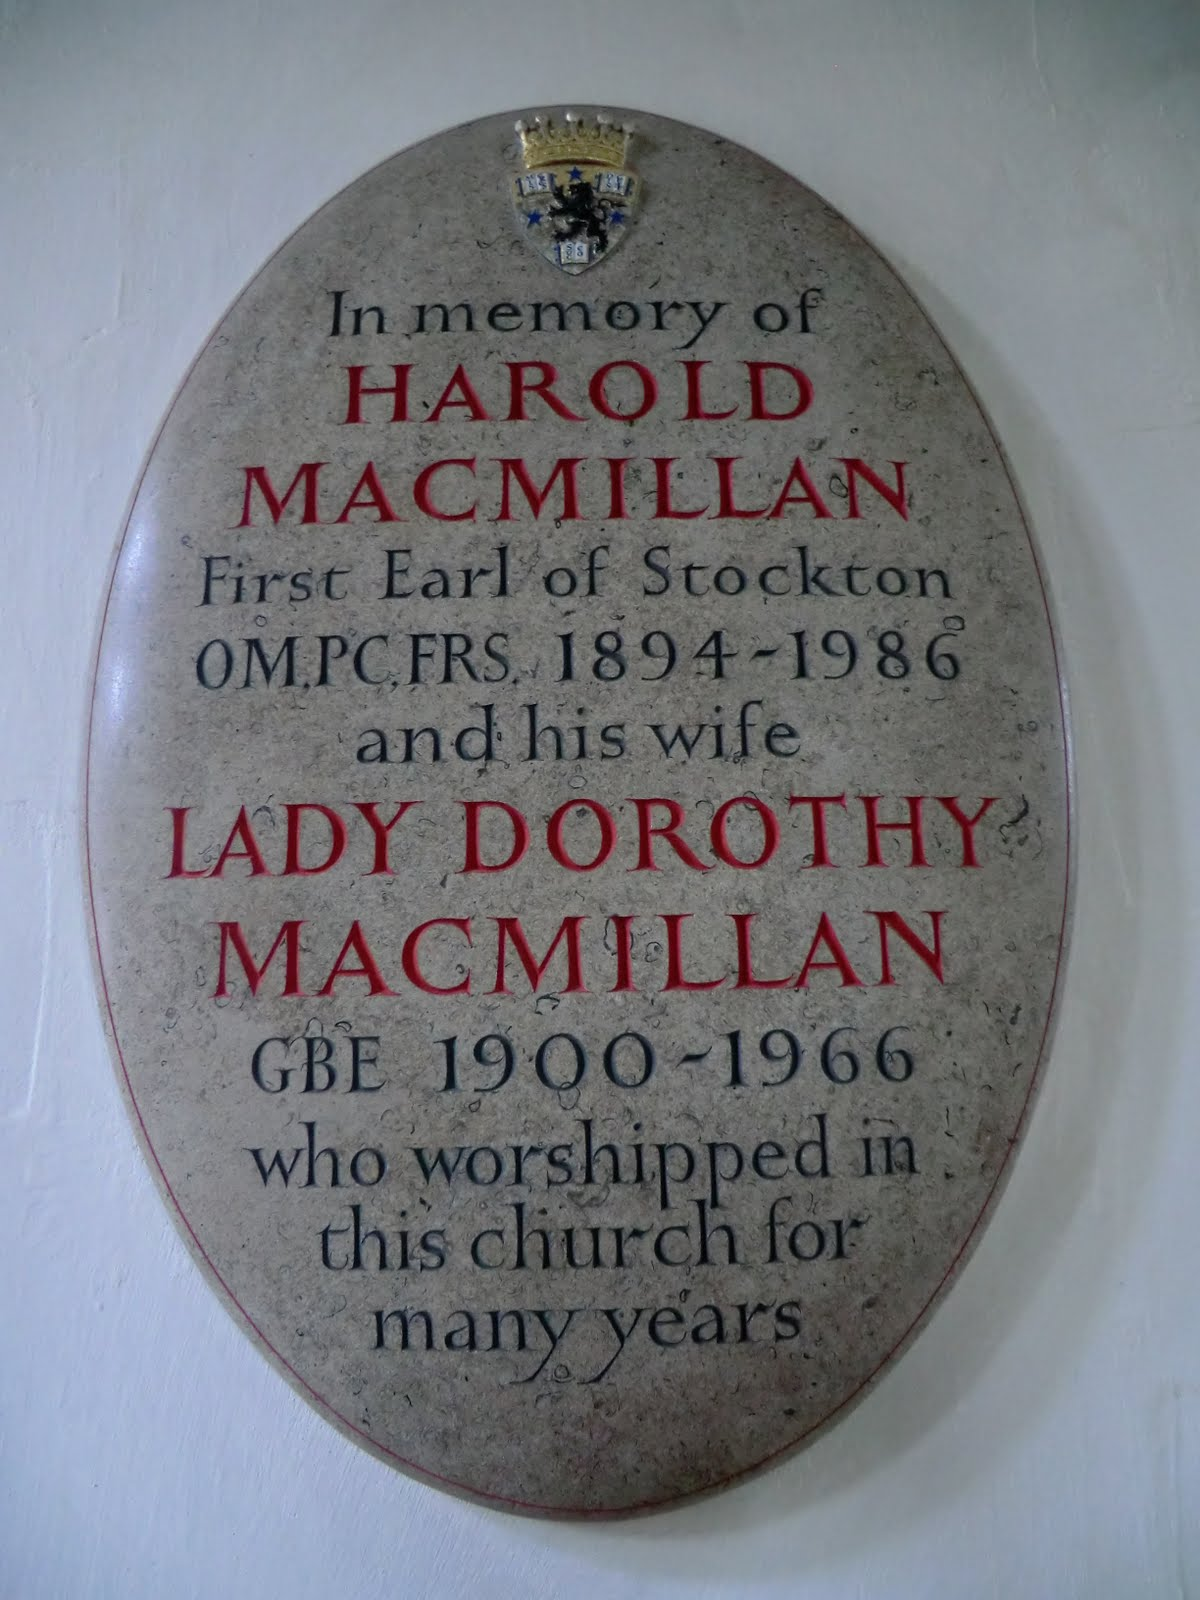 CIMG2962 MacMillan memorial, Horsted Keynes church